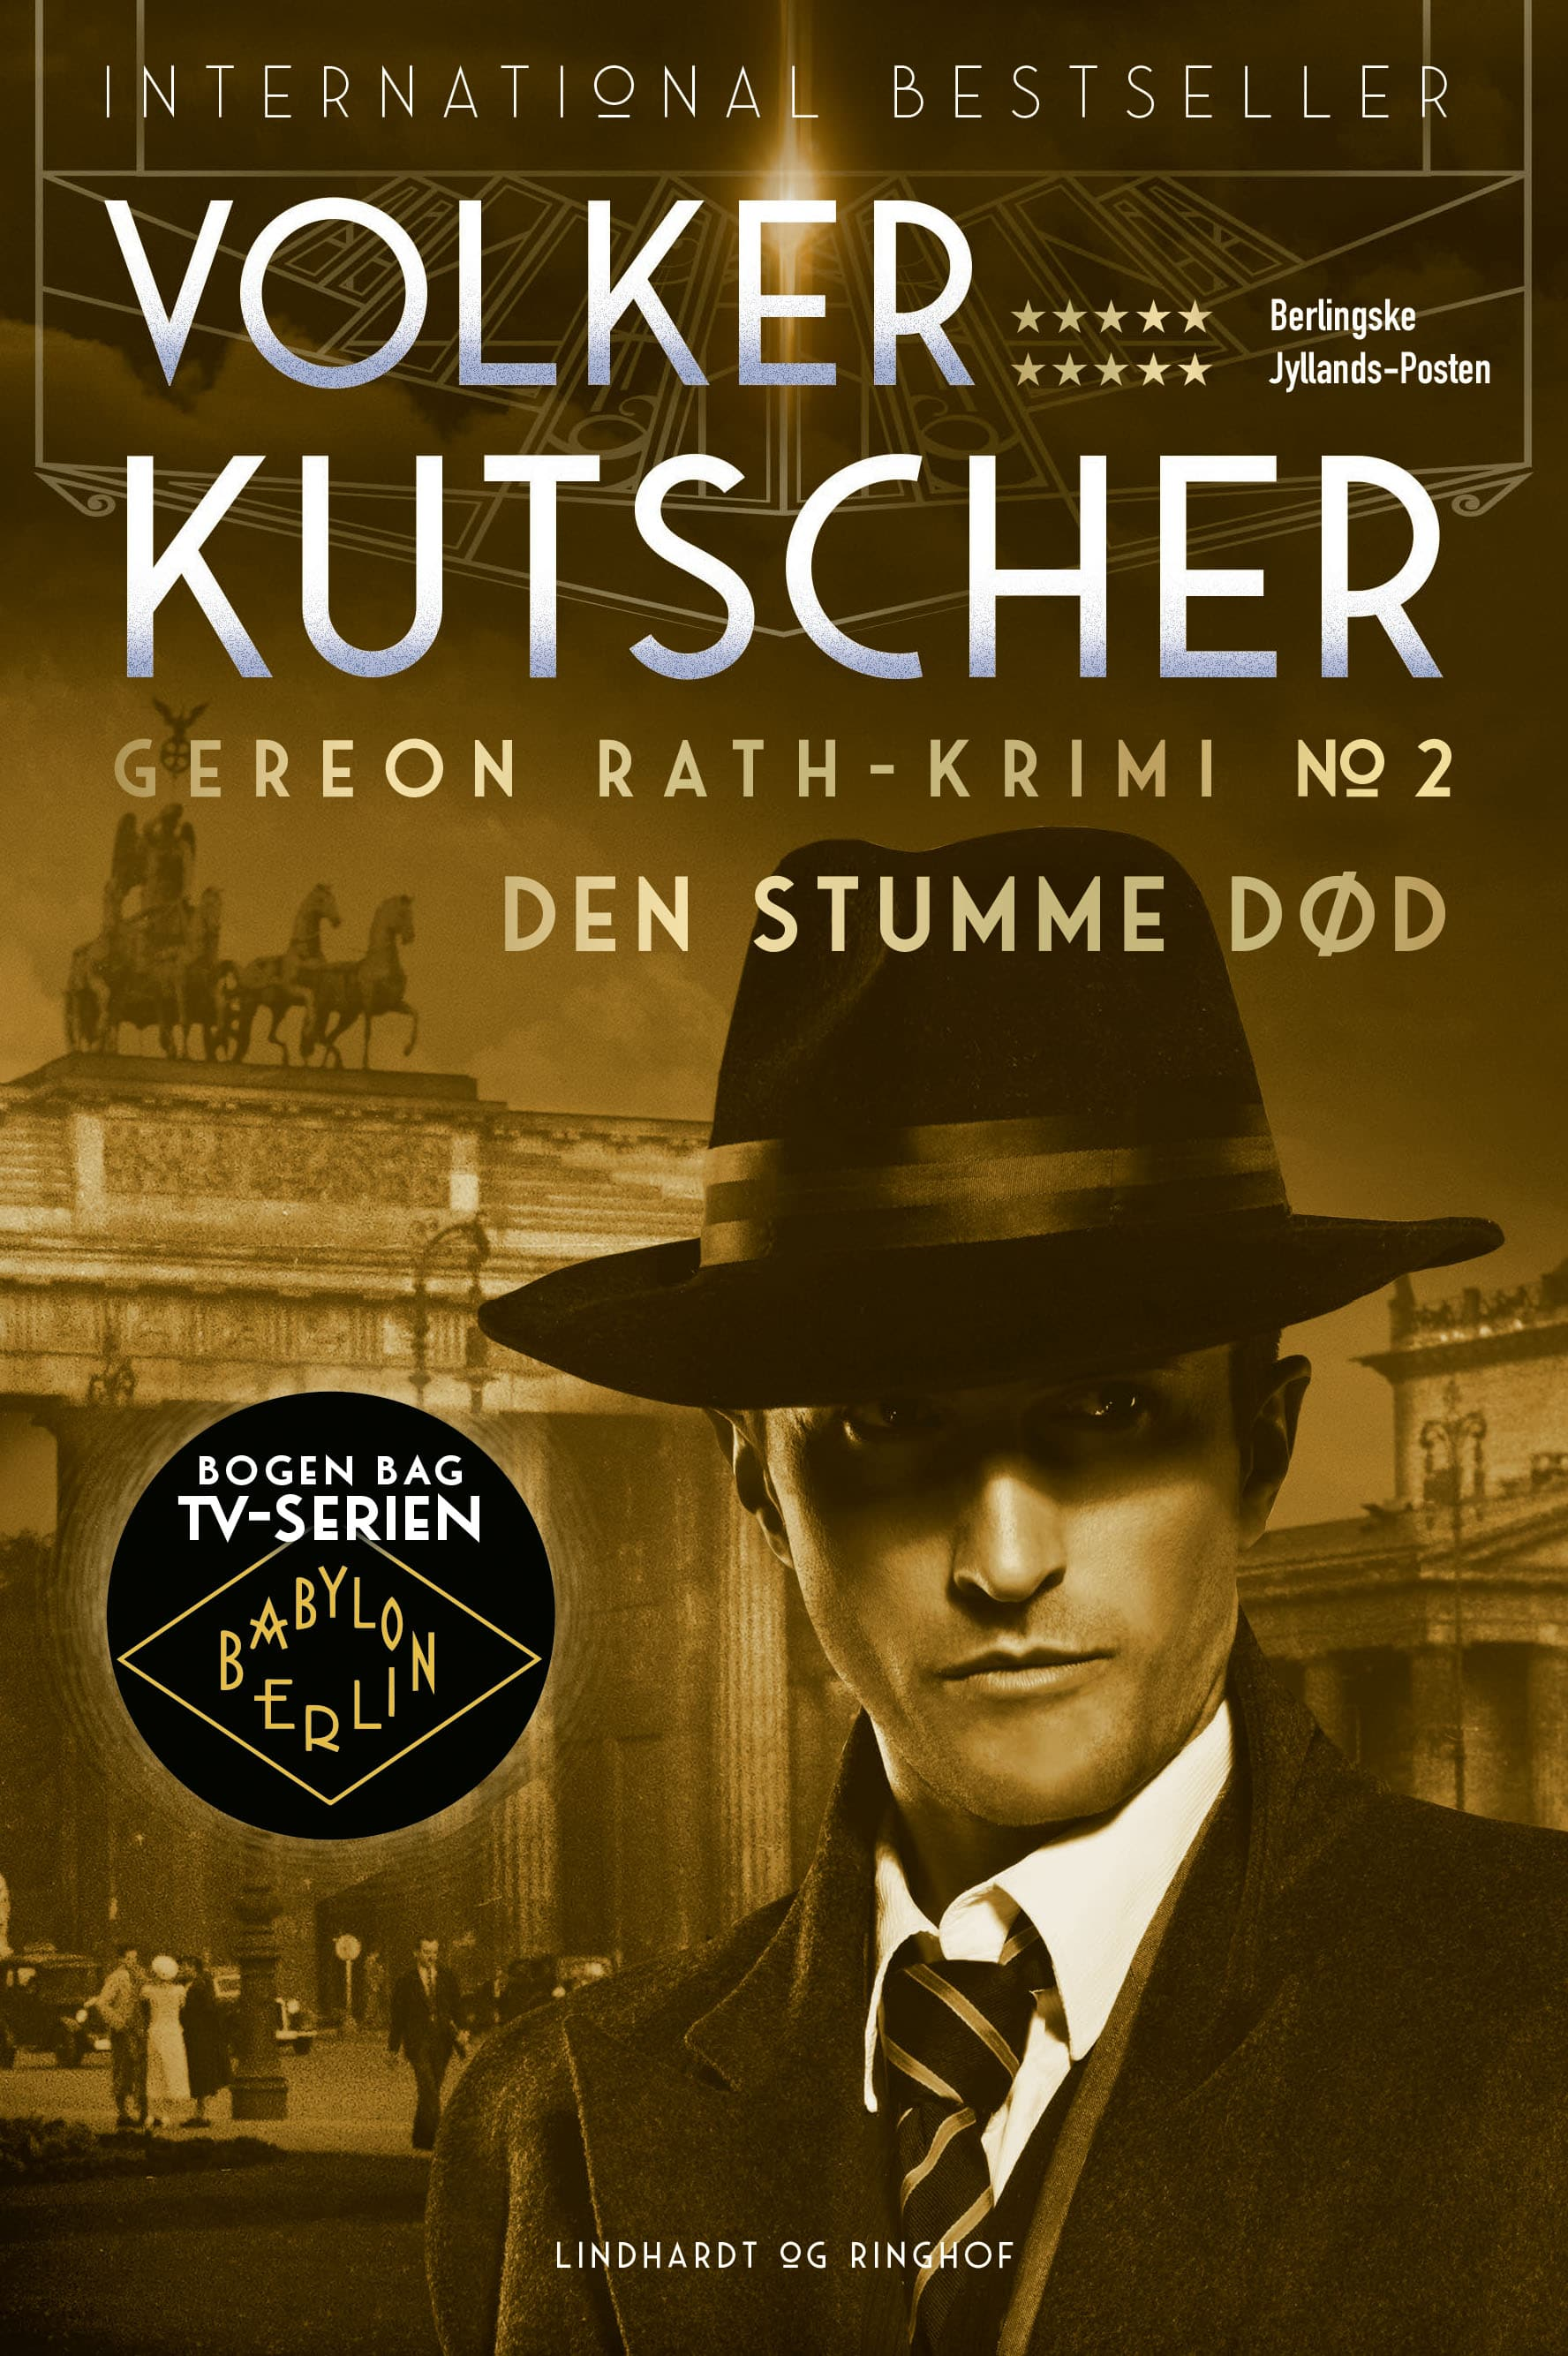 Babylon Berlin, Volker Kutscher, Gereon Rath, Den stumme død